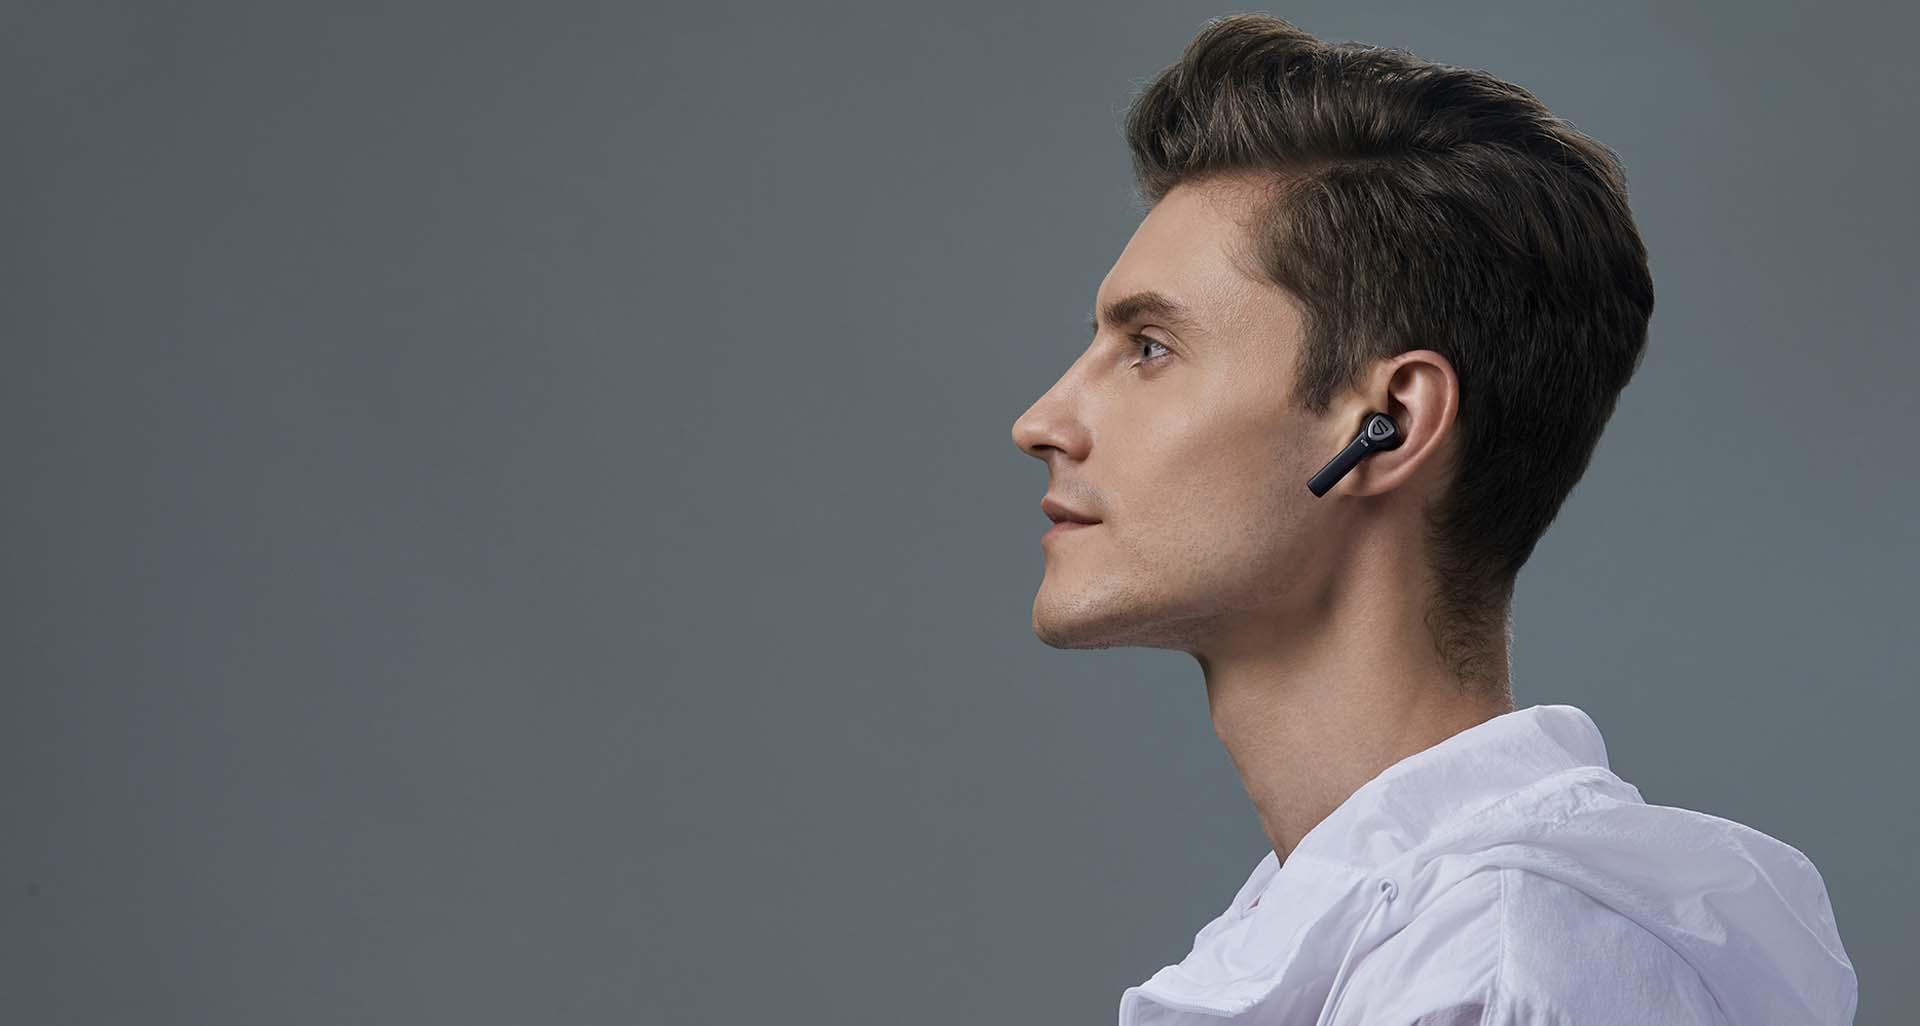 Hiệu suất làm việc của tai nghe Soundpeats Truecapsule 2